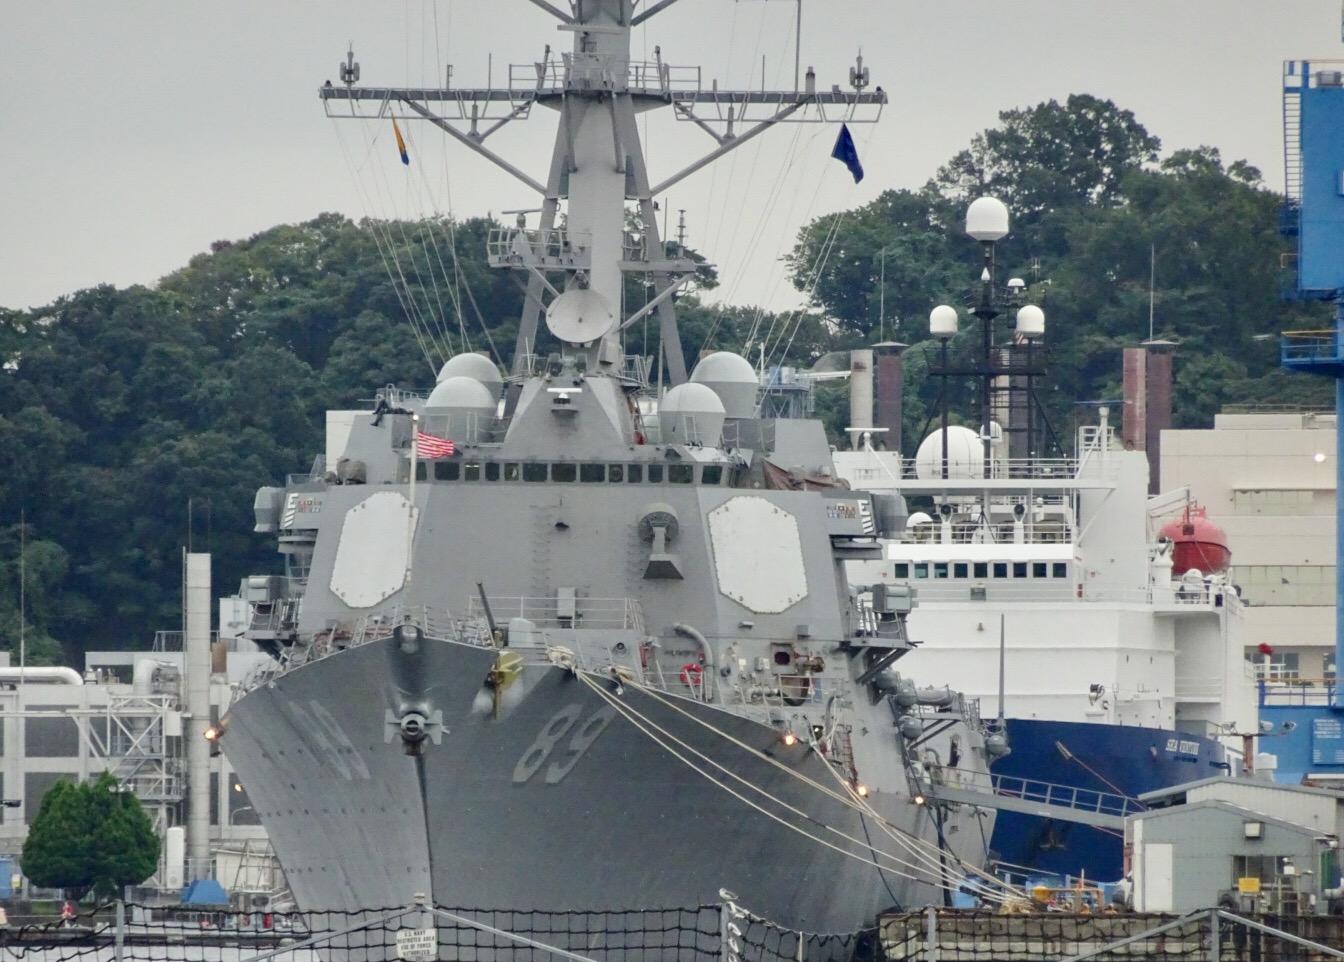 YOKOSUKA 軍港めぐり 横須賀 軍艦